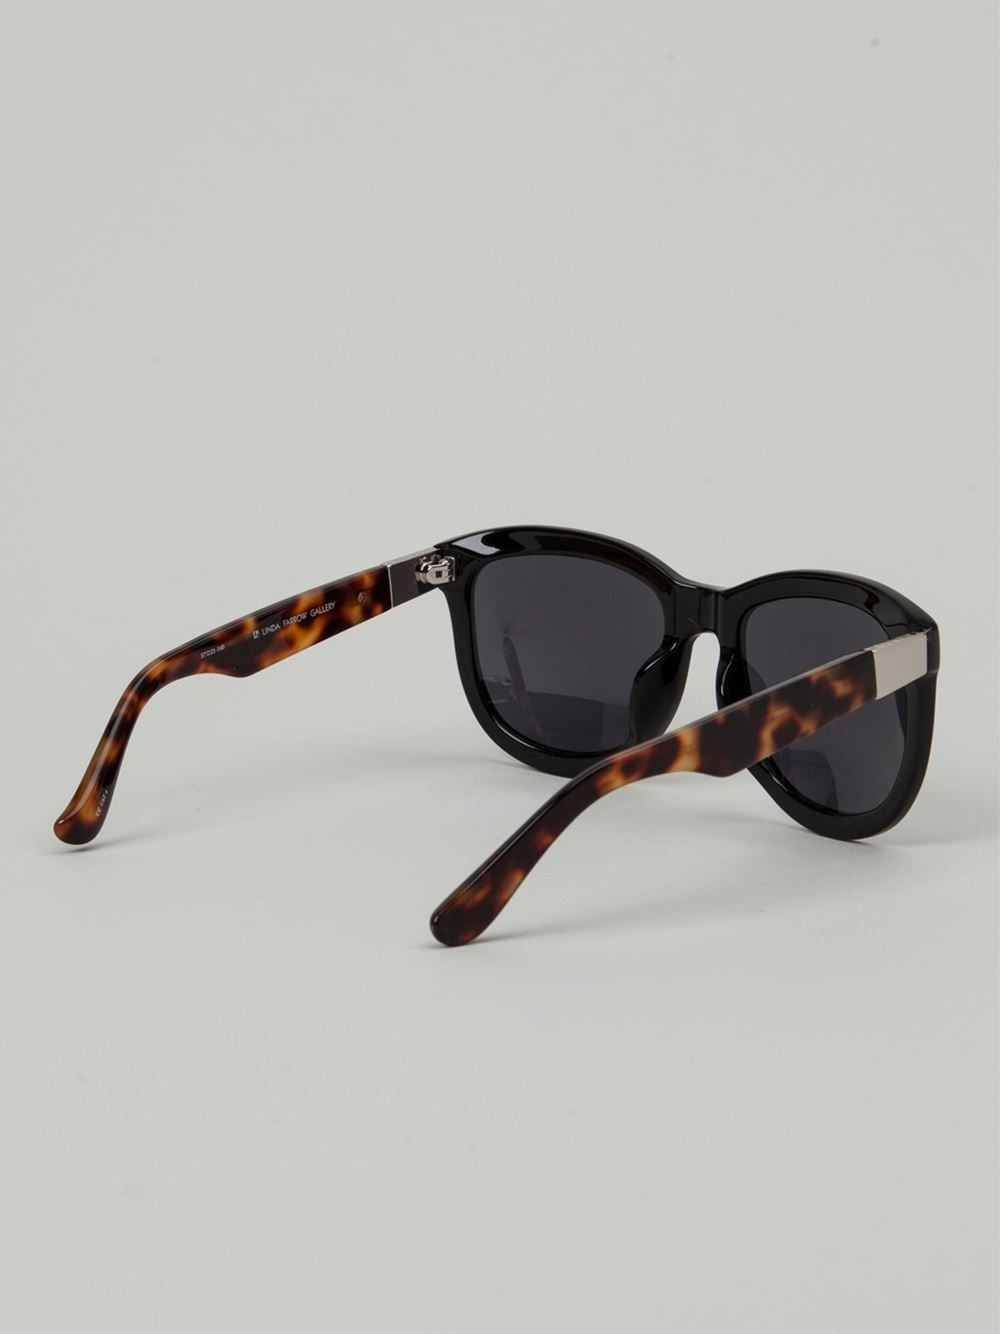 The Row ' X Linda Farrow Gallery 74' Sunglasses in Black